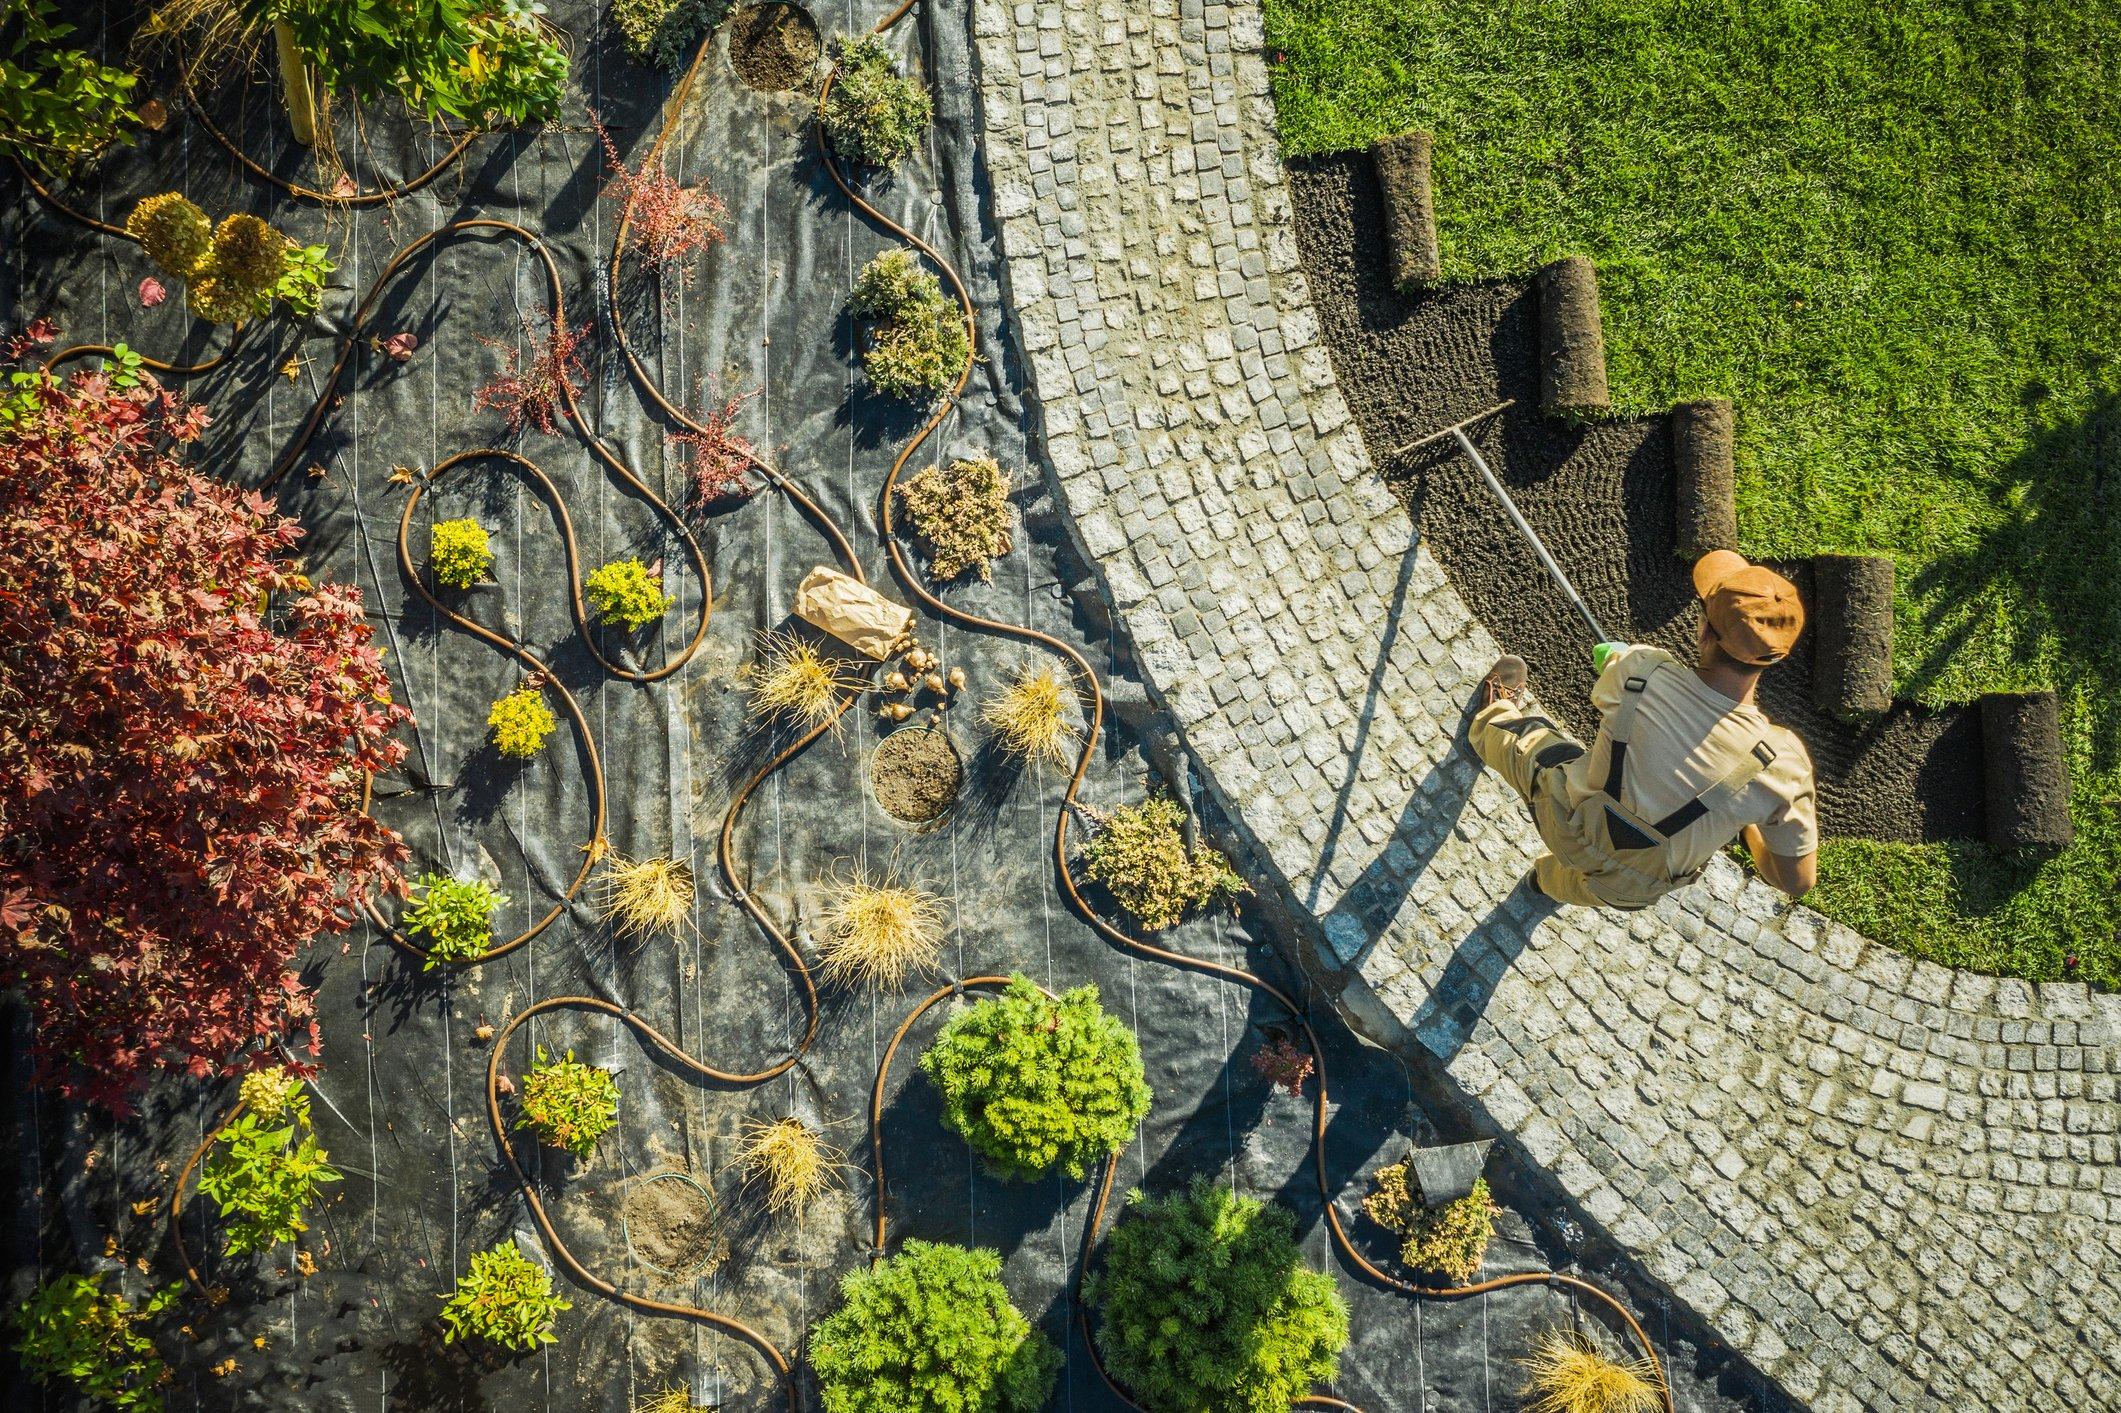 An aerial shot shows landscape technician installing sod